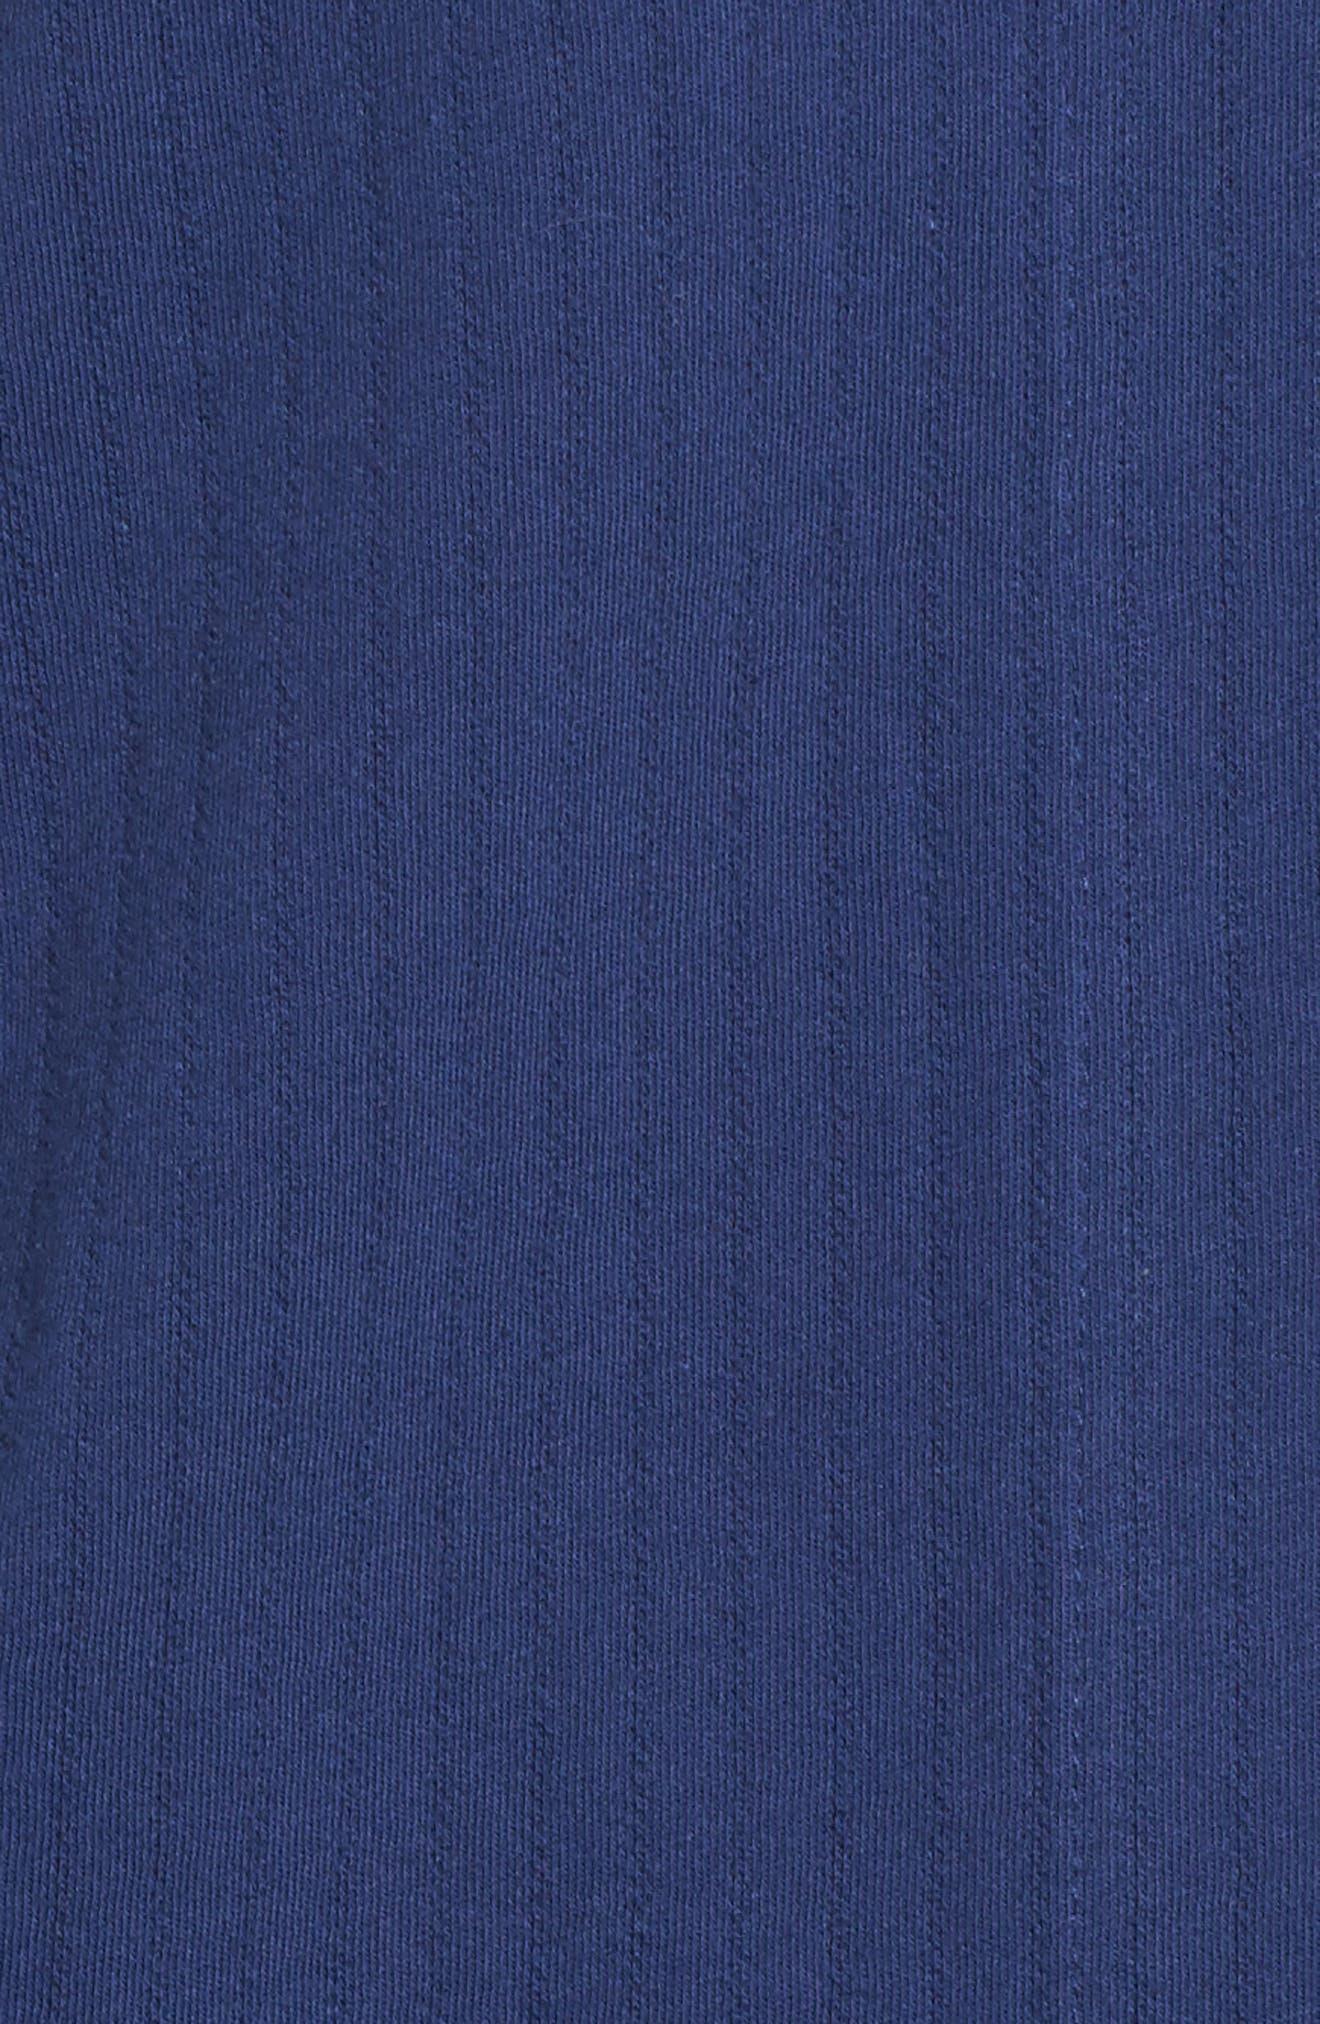 Notched Collar Pajamas,                             Alternate thumbnail 6, color,                             Navy